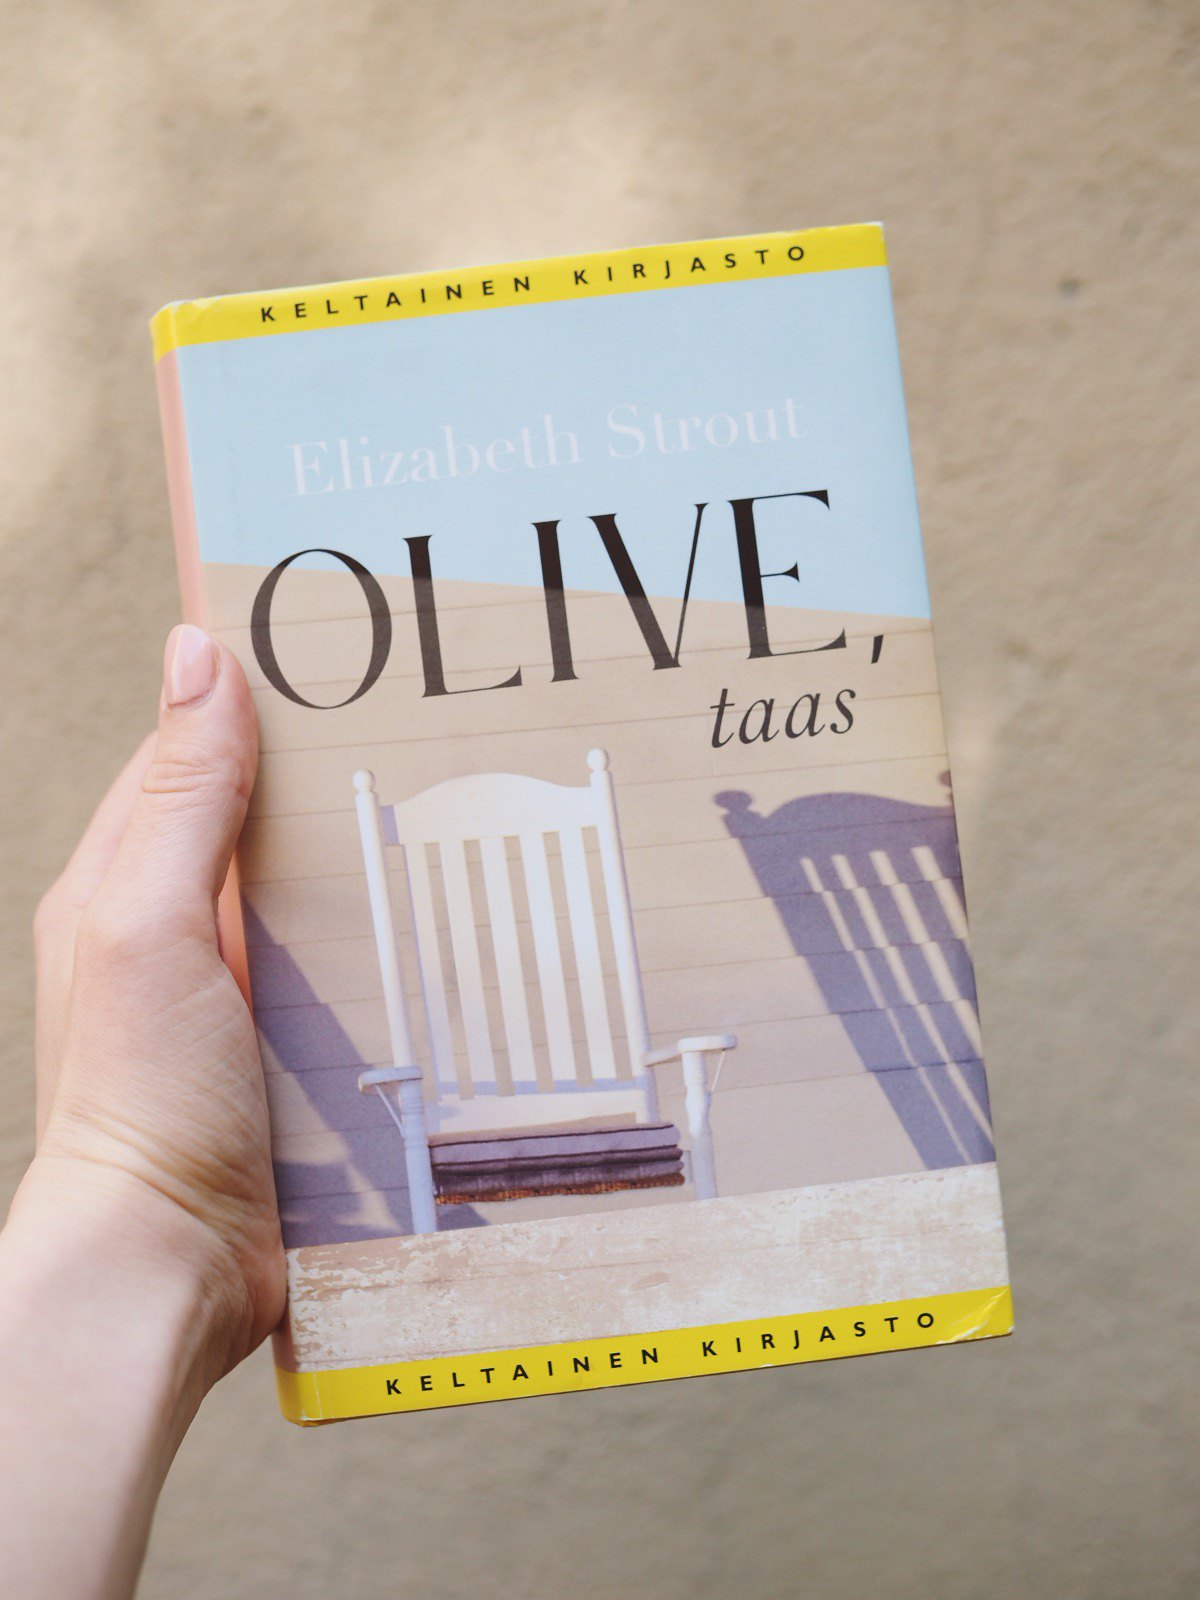 Elizabeth Strout - Olive, taas